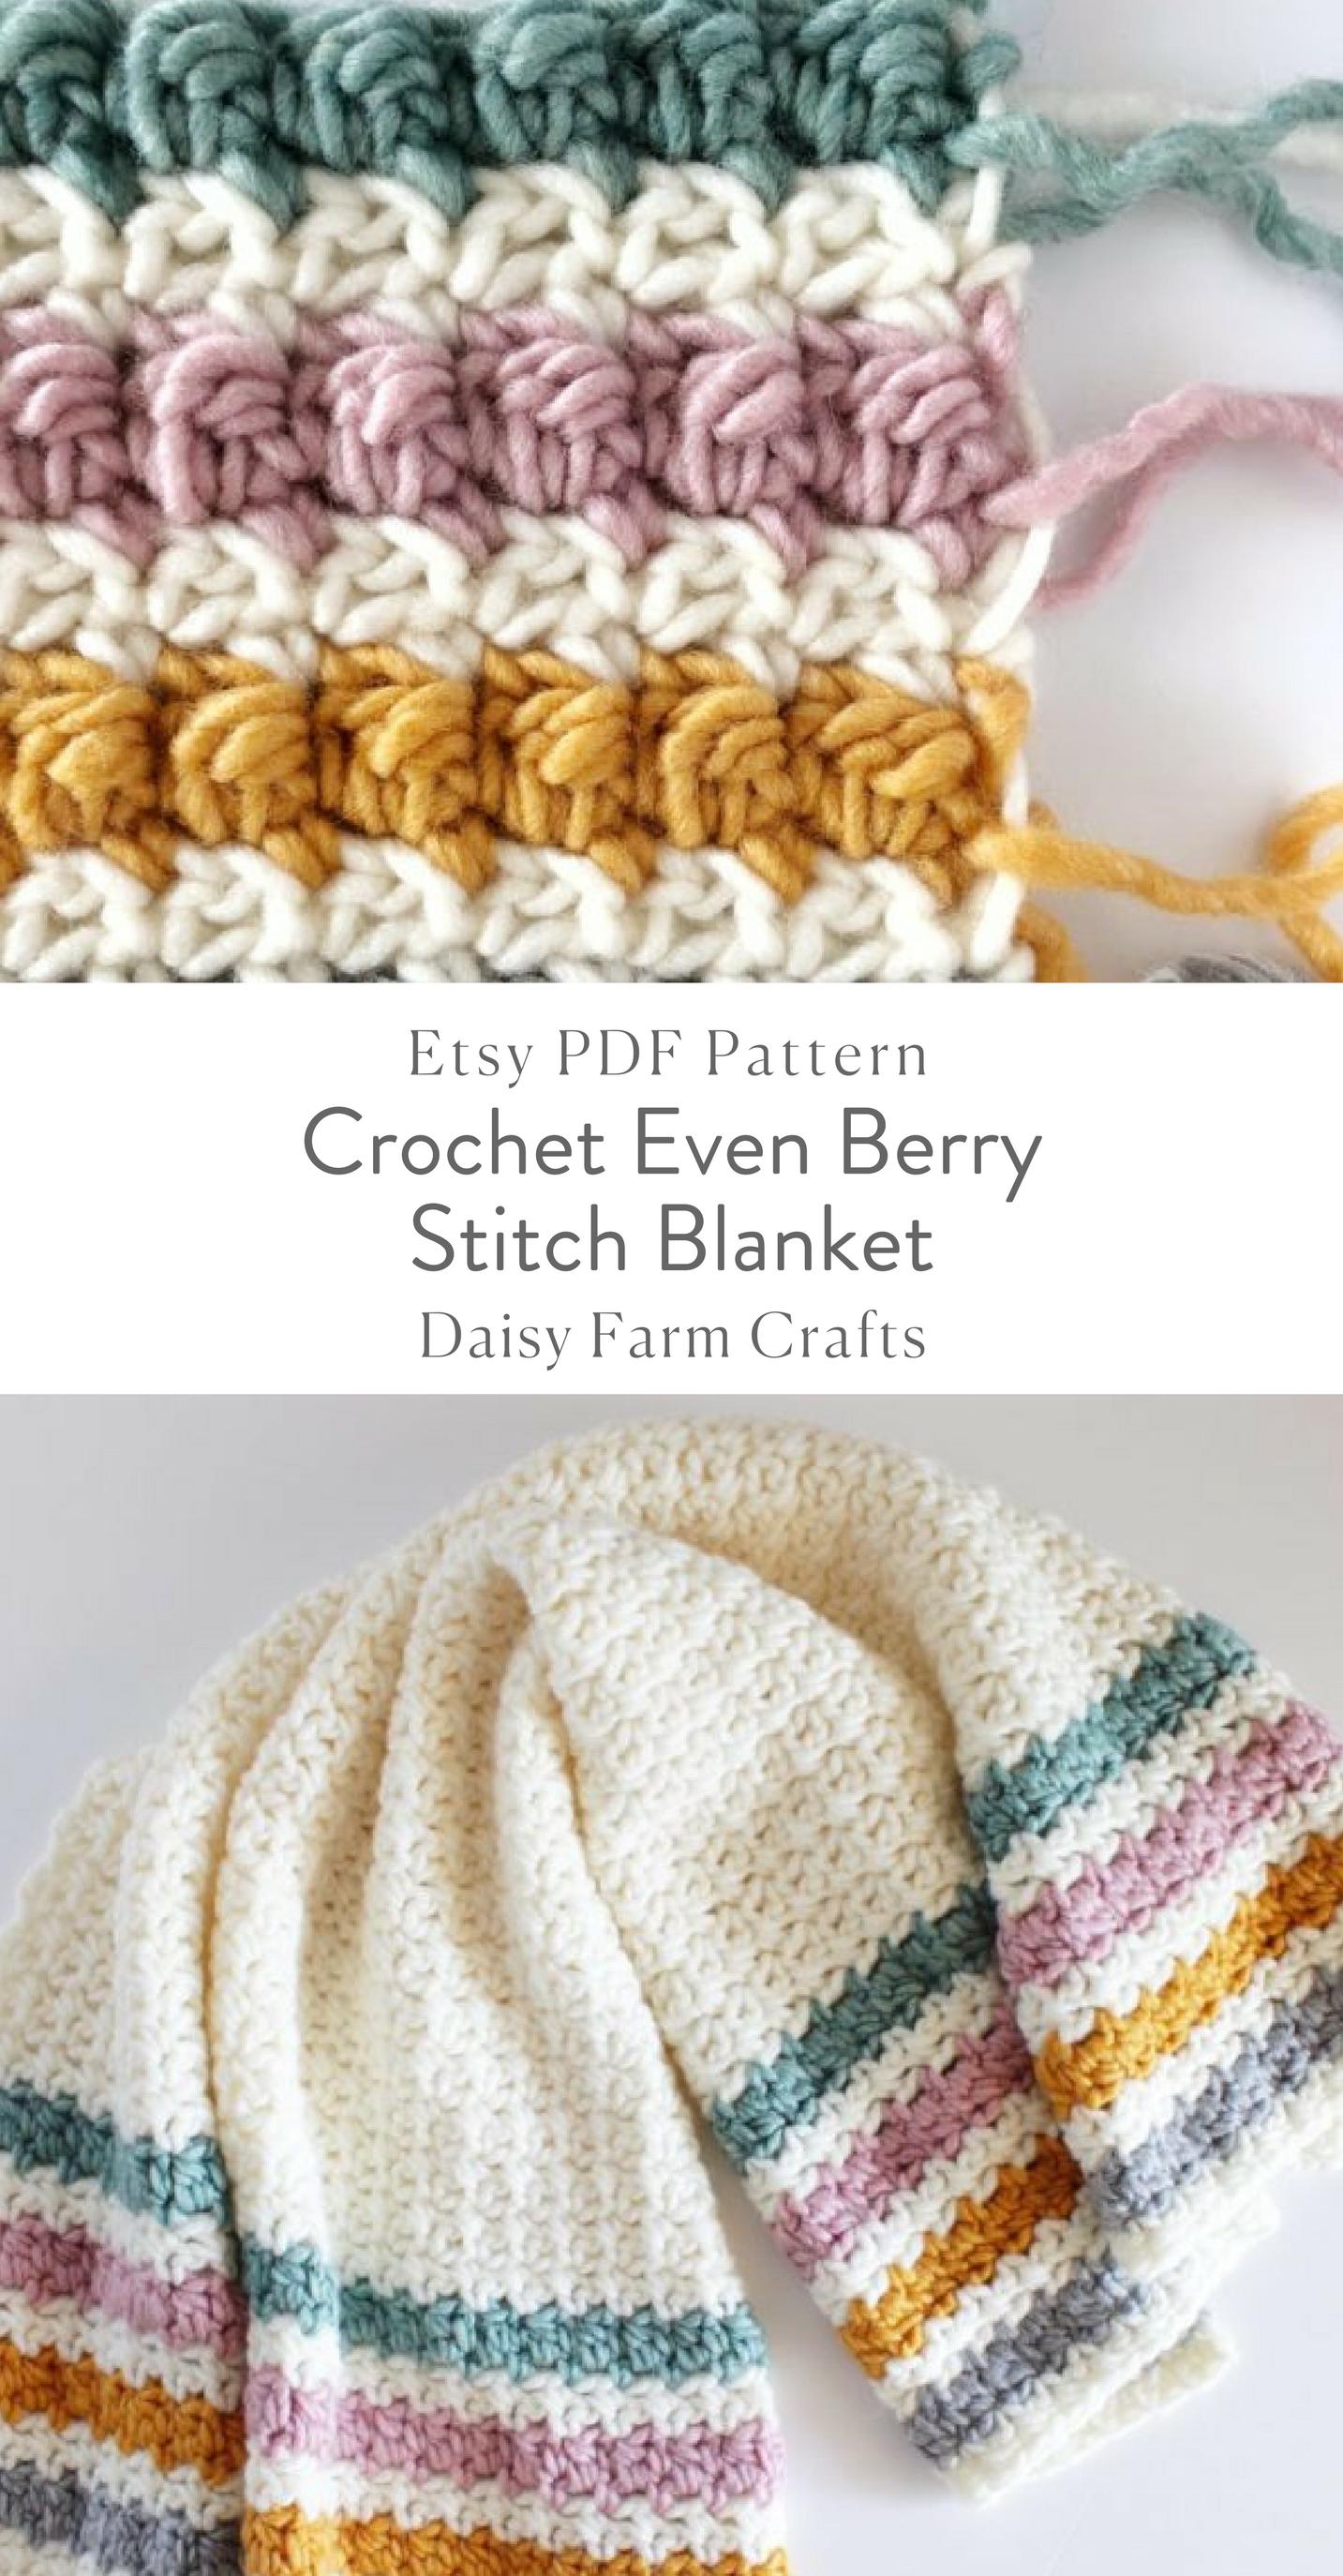 Crochet Even Berry Stitch Blanket Pattern | Stitches | Pinterest ...